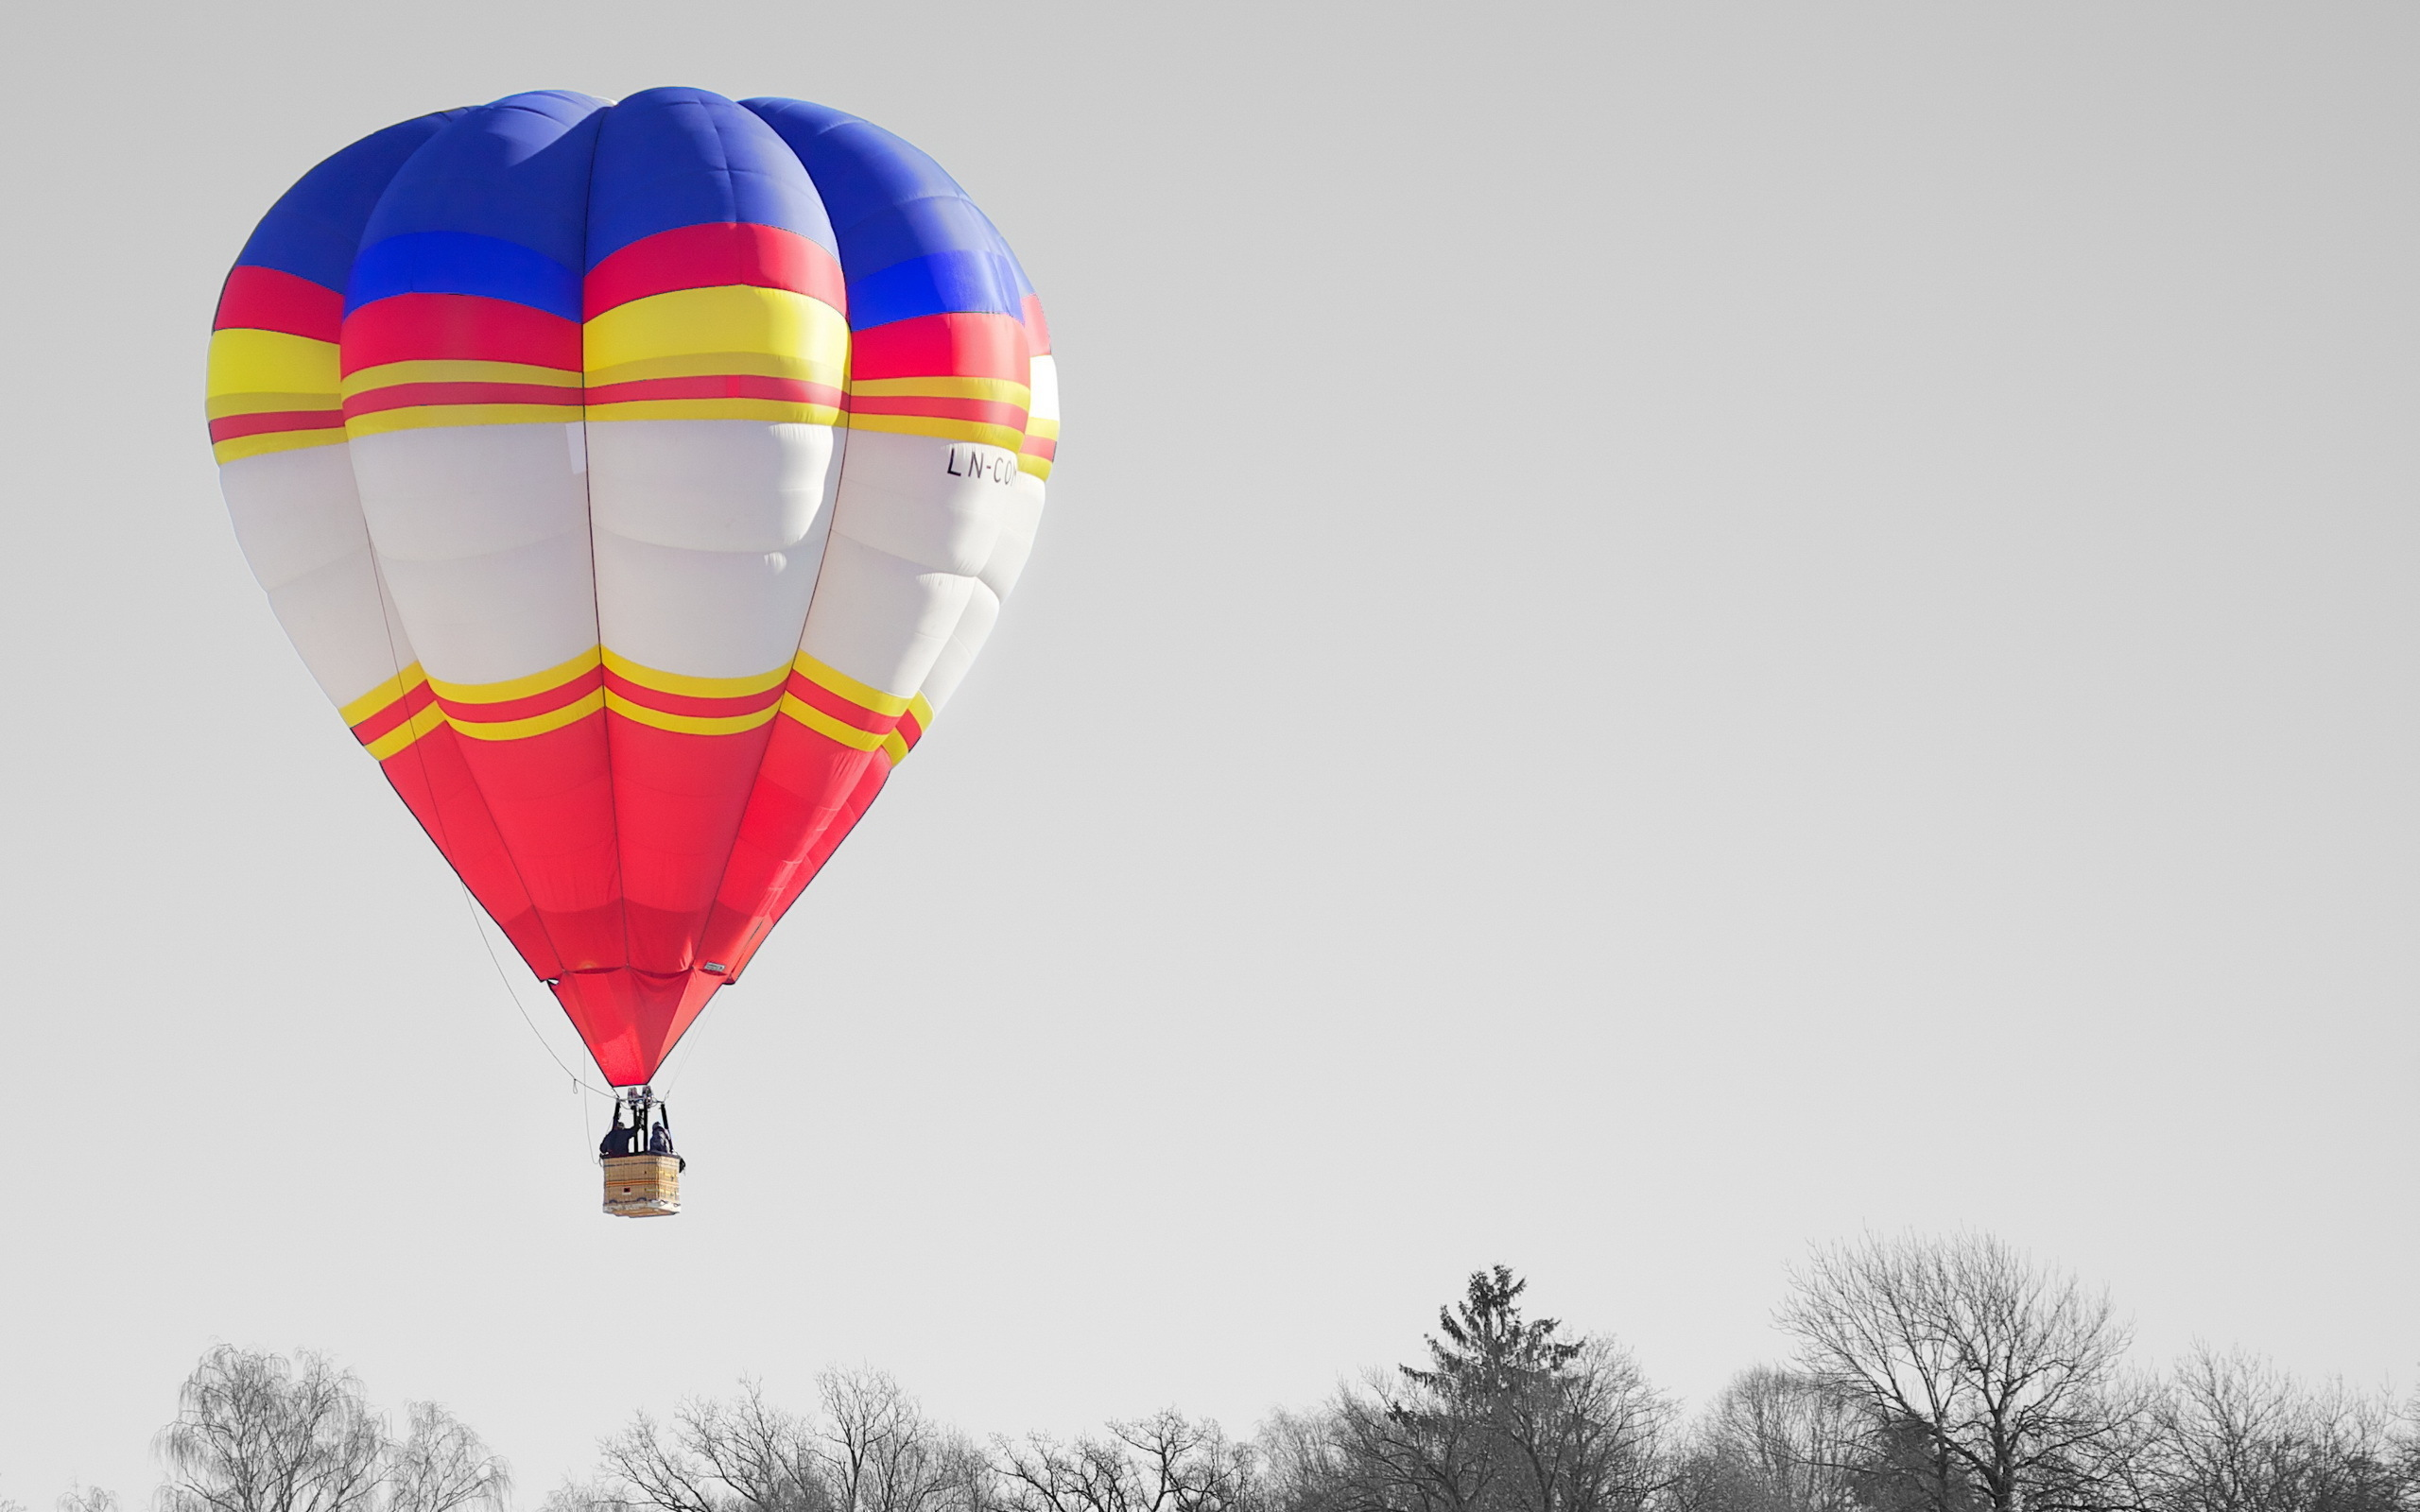 Balloon sky 2560 x 1600 download close